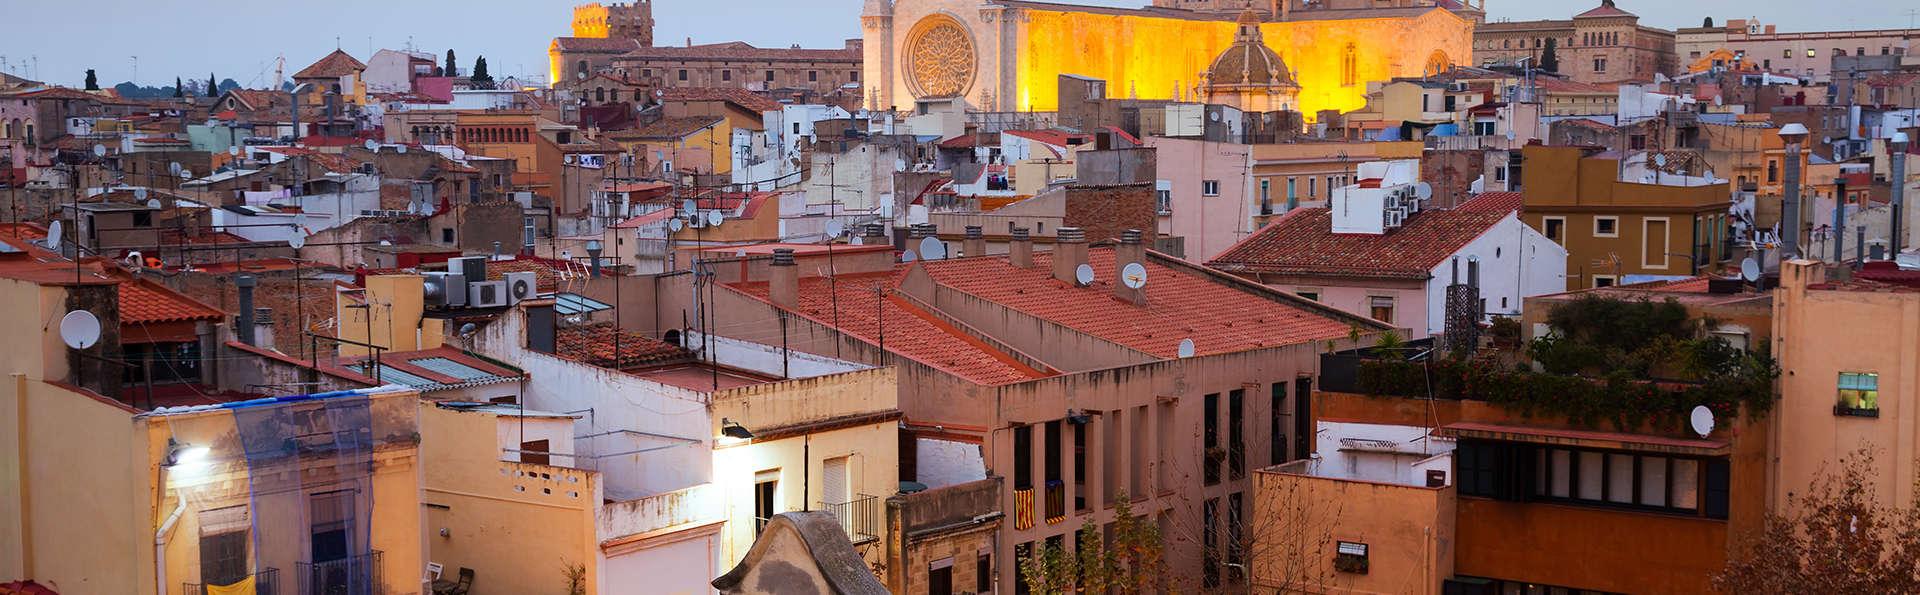 Hotel Lauria - Edit_Tarragona.jpg